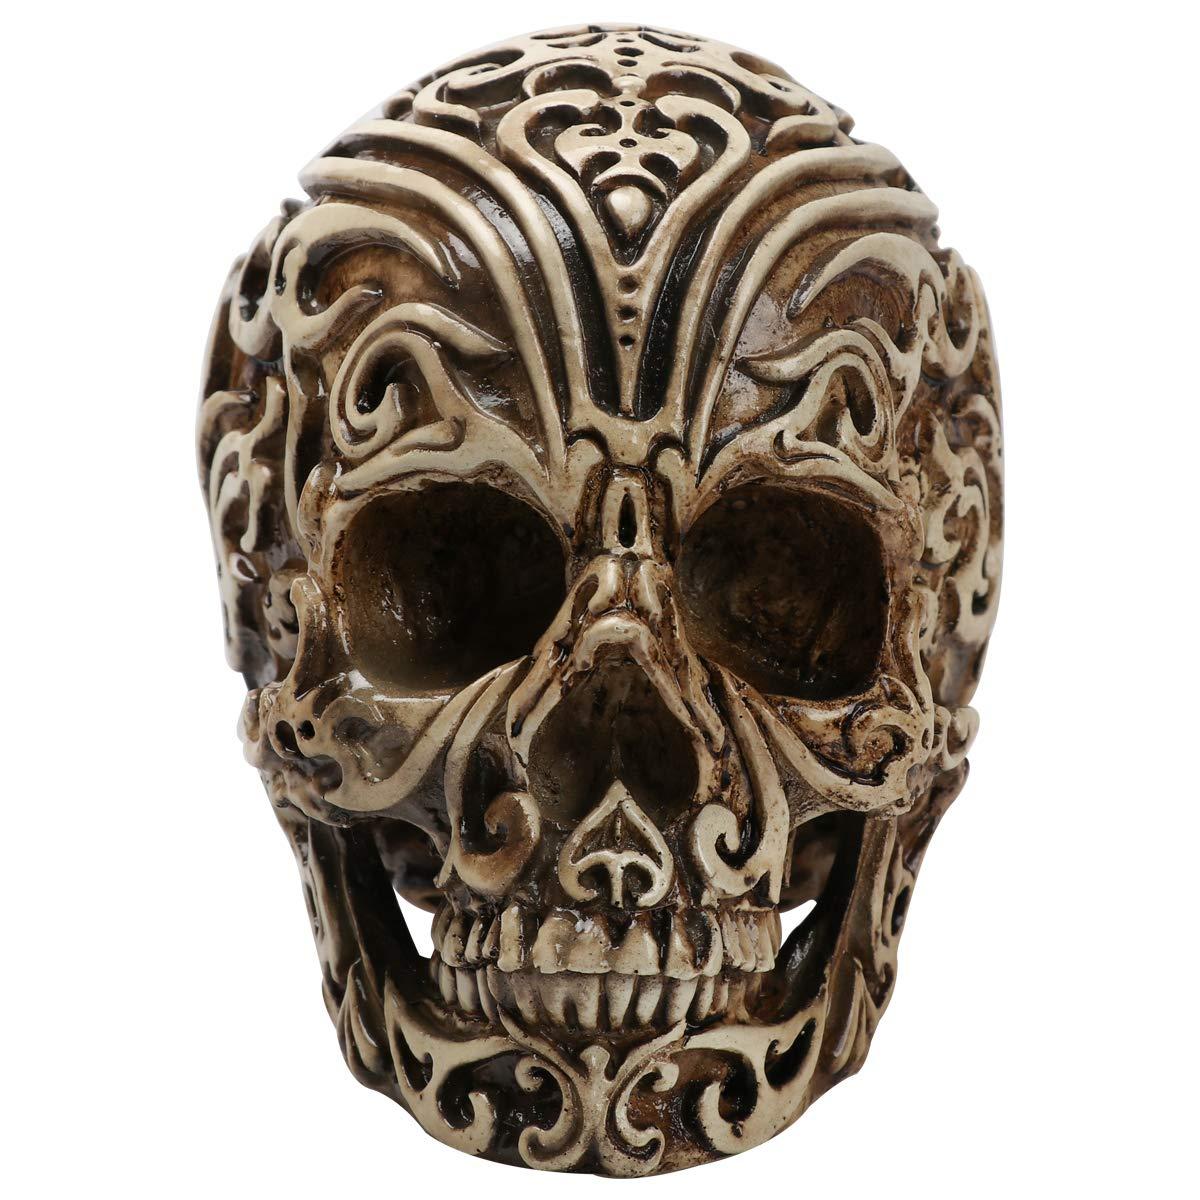 Black CHDL Grinning Realistic Replica Human Skull Shantou Home Statue Skull Head Bone Model